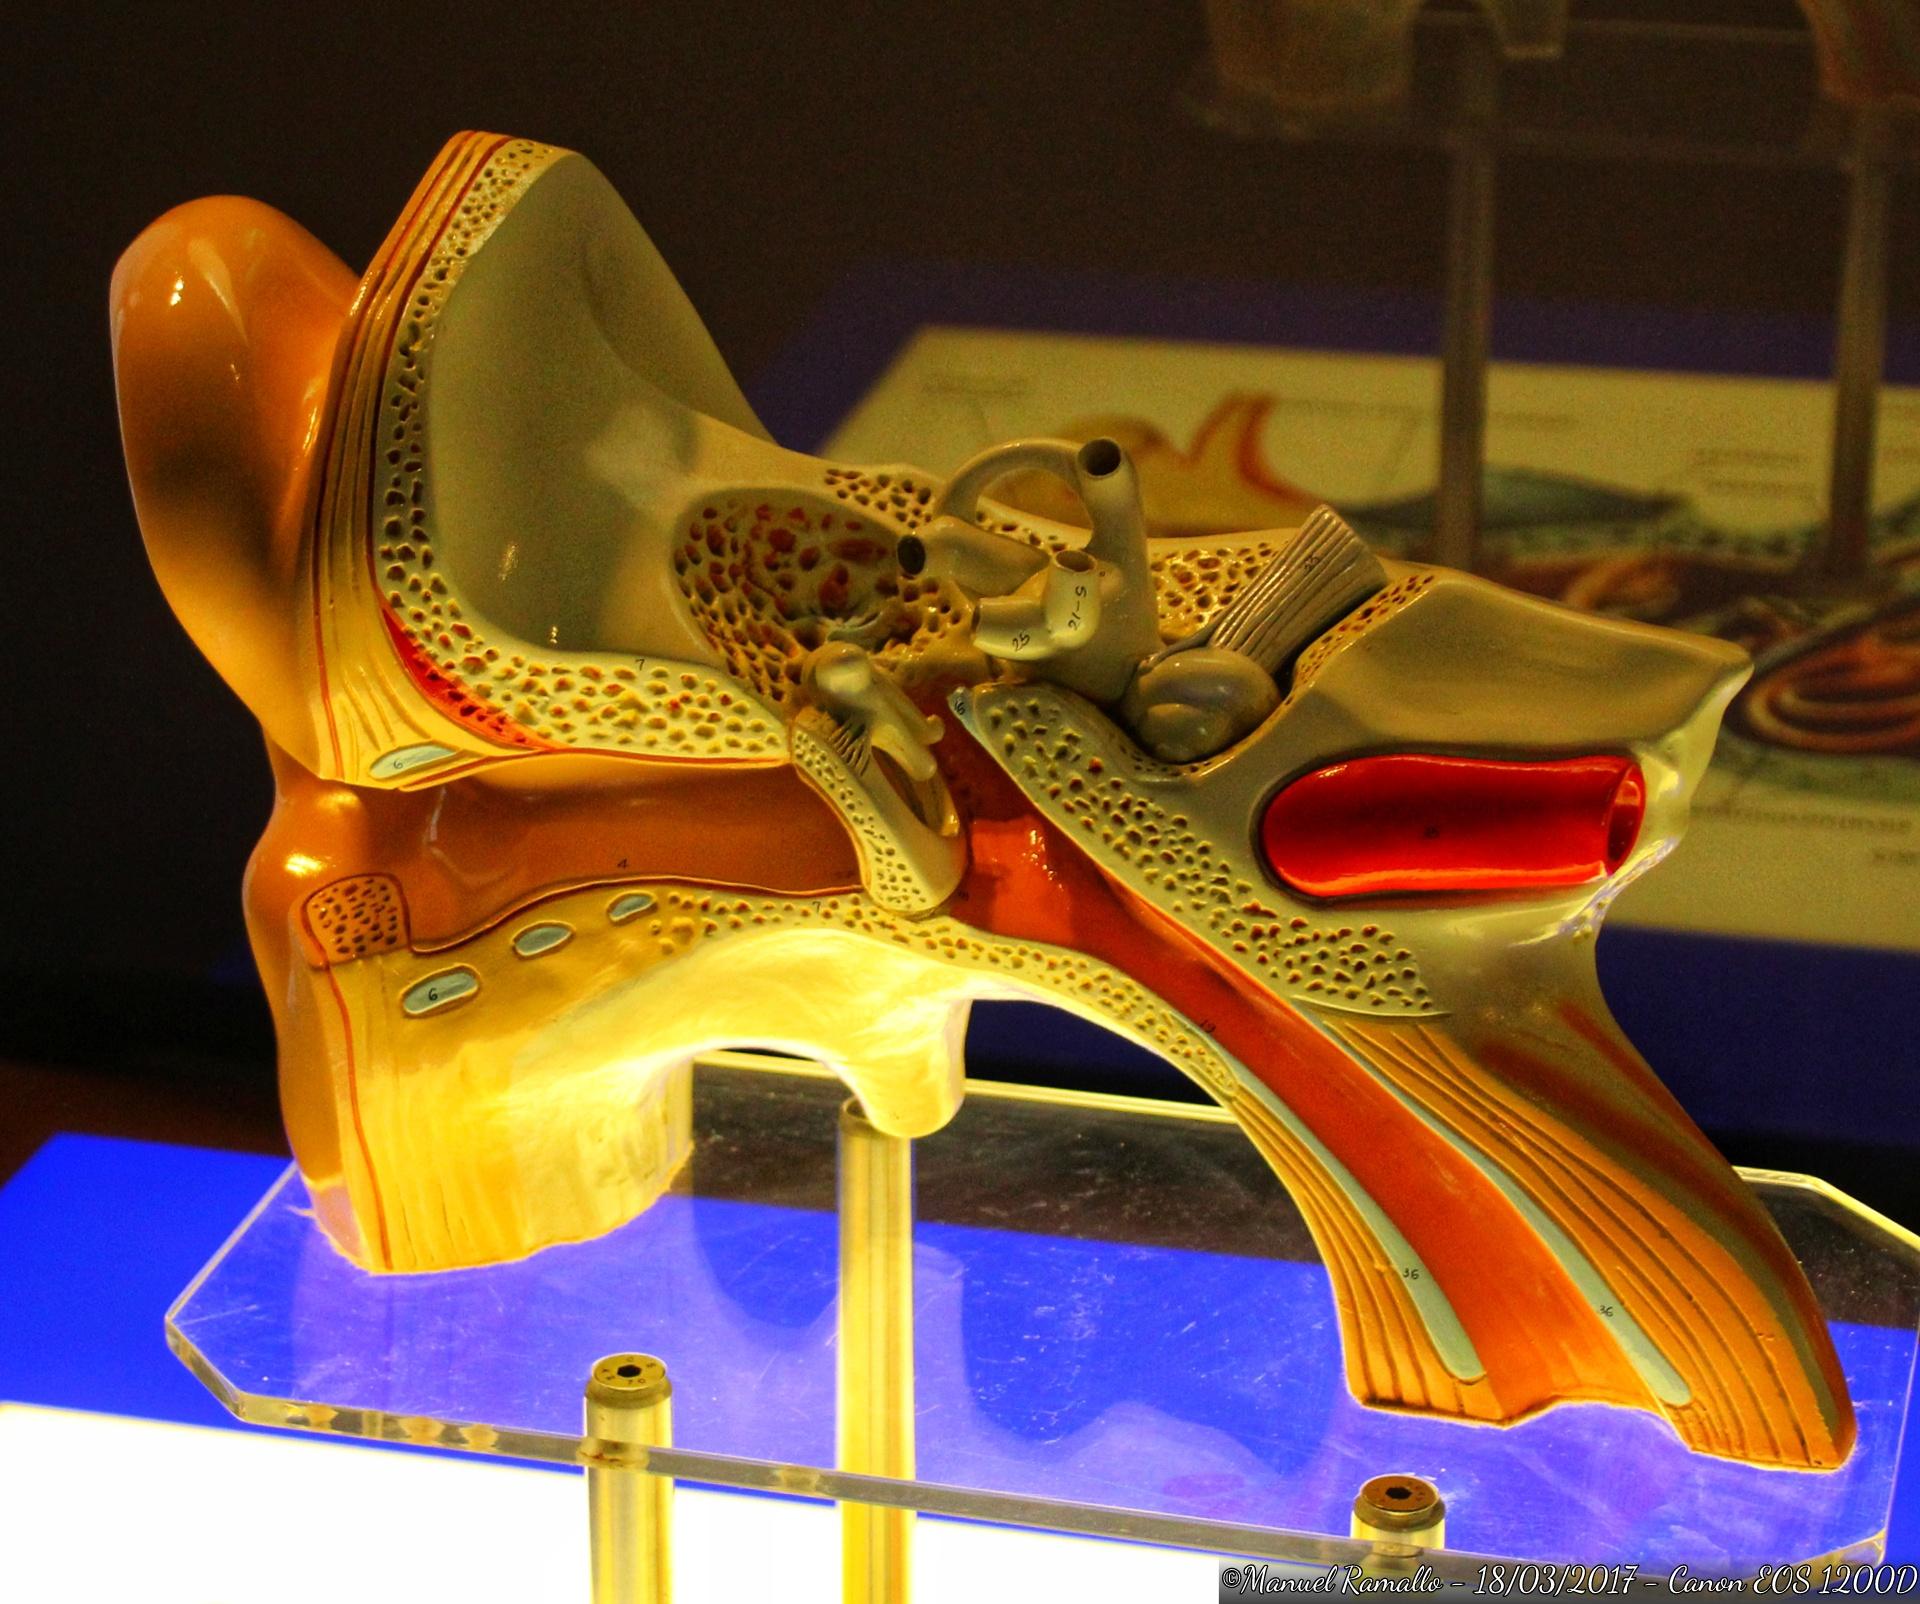 maqueta-estructura-oido-humano-domus-museo-coruna